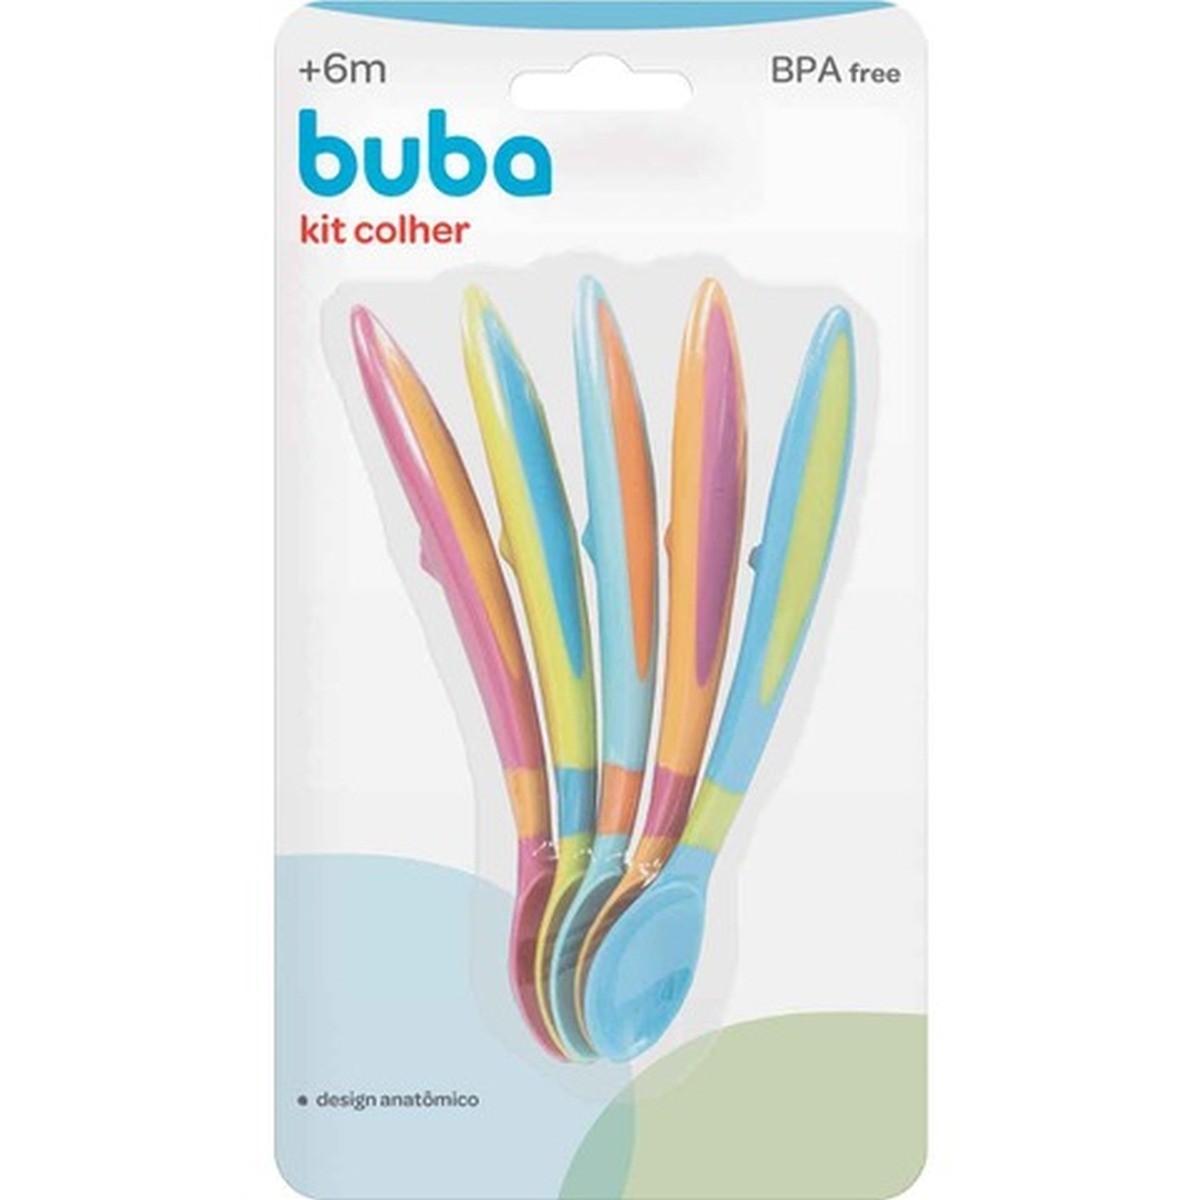 Kit 5 Colheres Coloridas Divertidas Para Bebê Buba